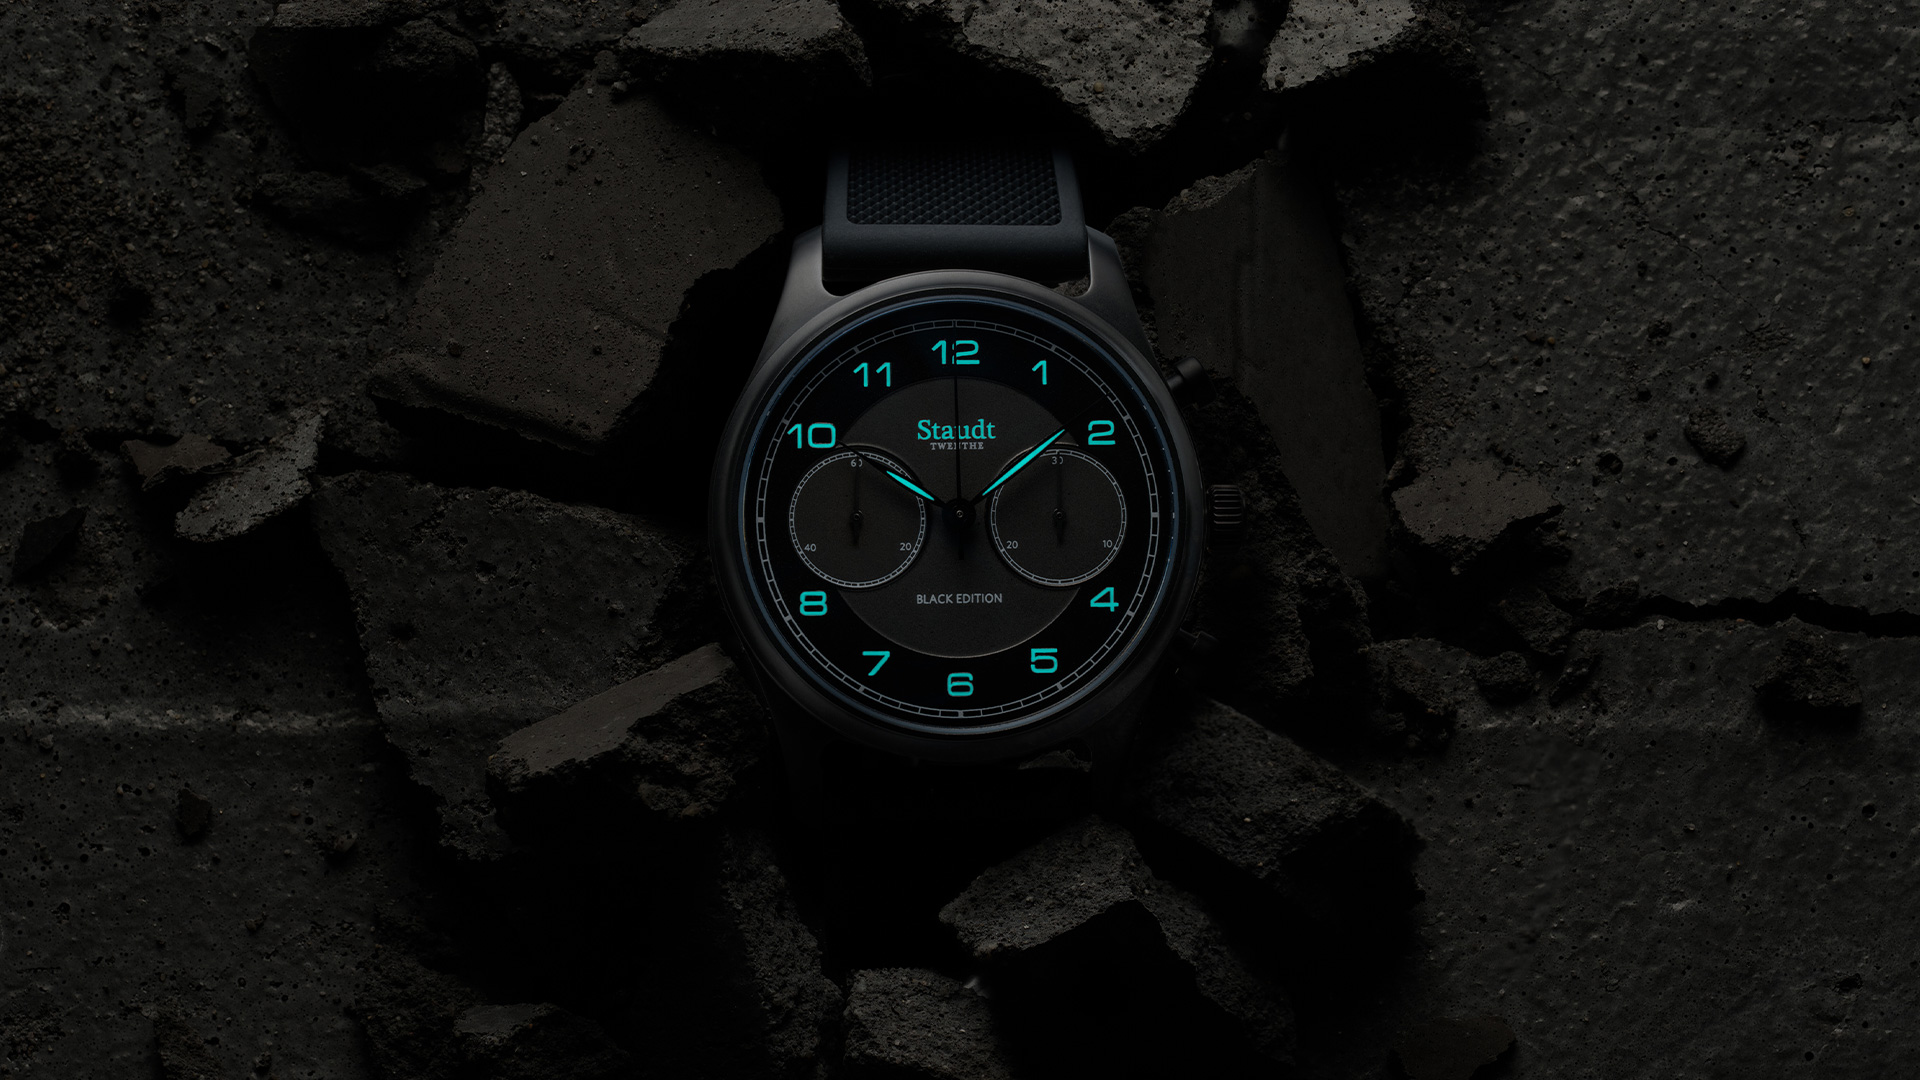 https://www.staudt-twenthe.com/wp-content/uploads/2019/11/Staudt-Praeludium-Chronograph-Black-Edition4.jpg